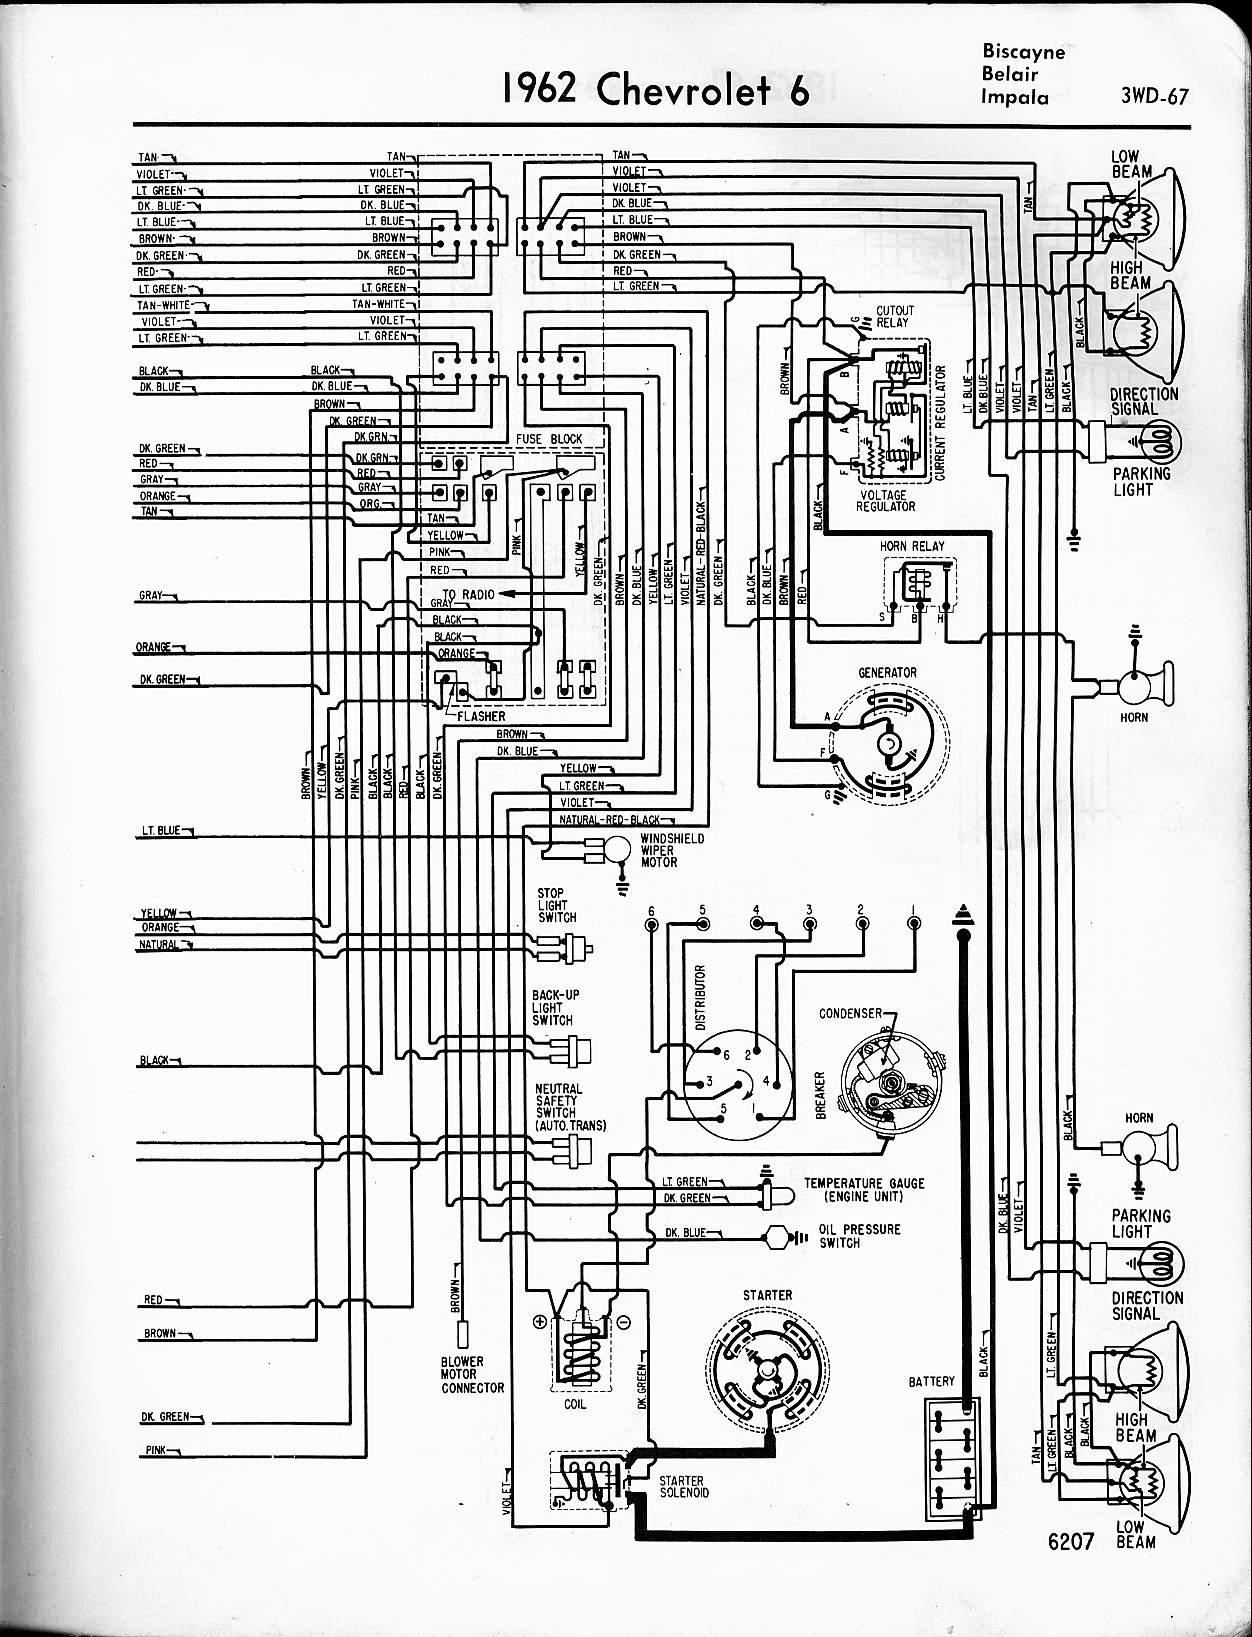 1964 Chevy Impala Starter Wiring